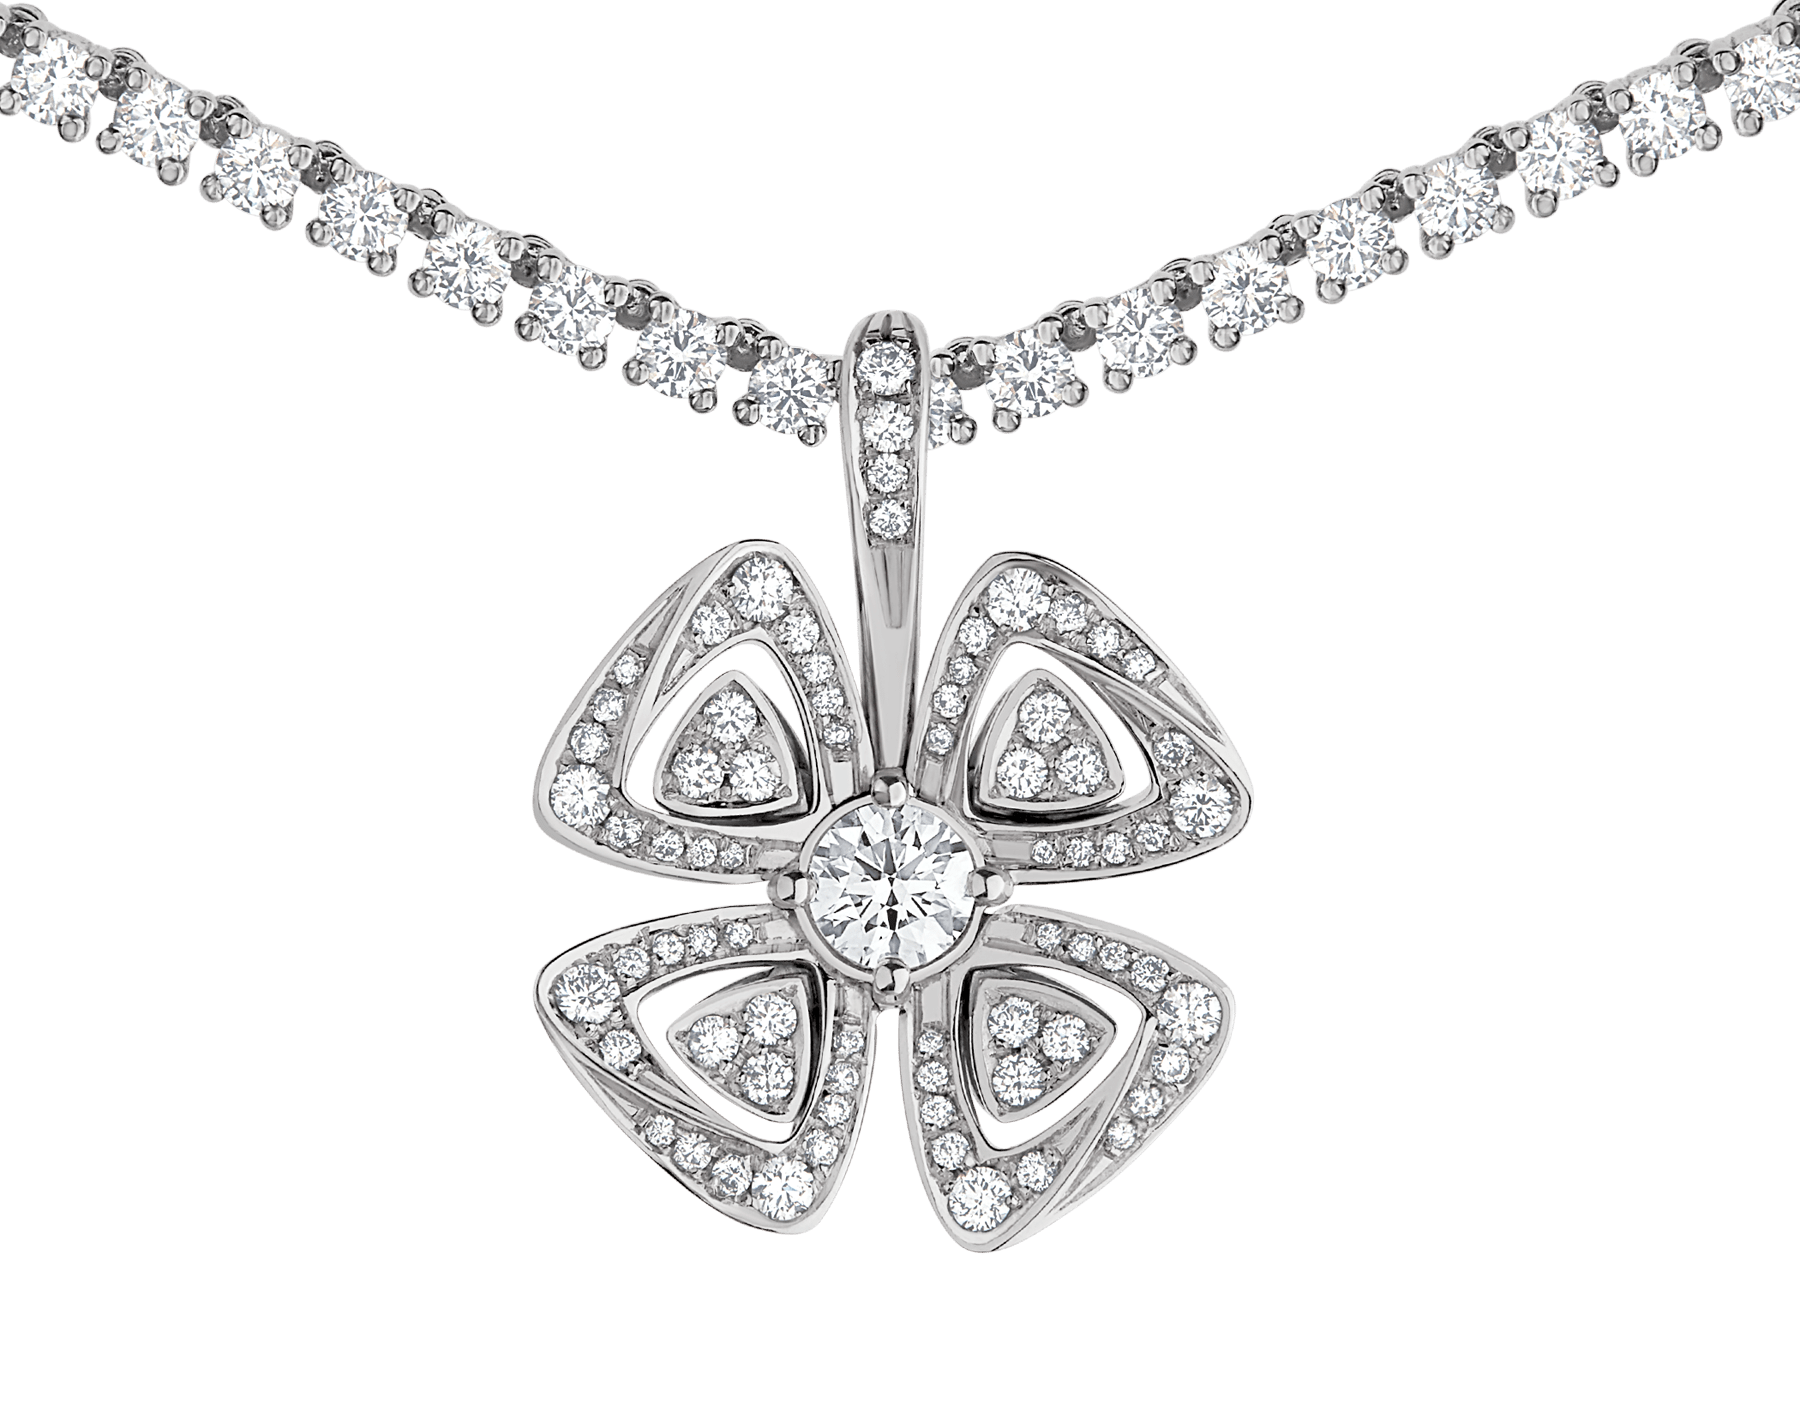 Fiorever 18 kt white gold convertible pendant necklace set with brilliant-cut diamonds (5.55 ct) and pavé diamonds (0.41 ct) 358351 image 3